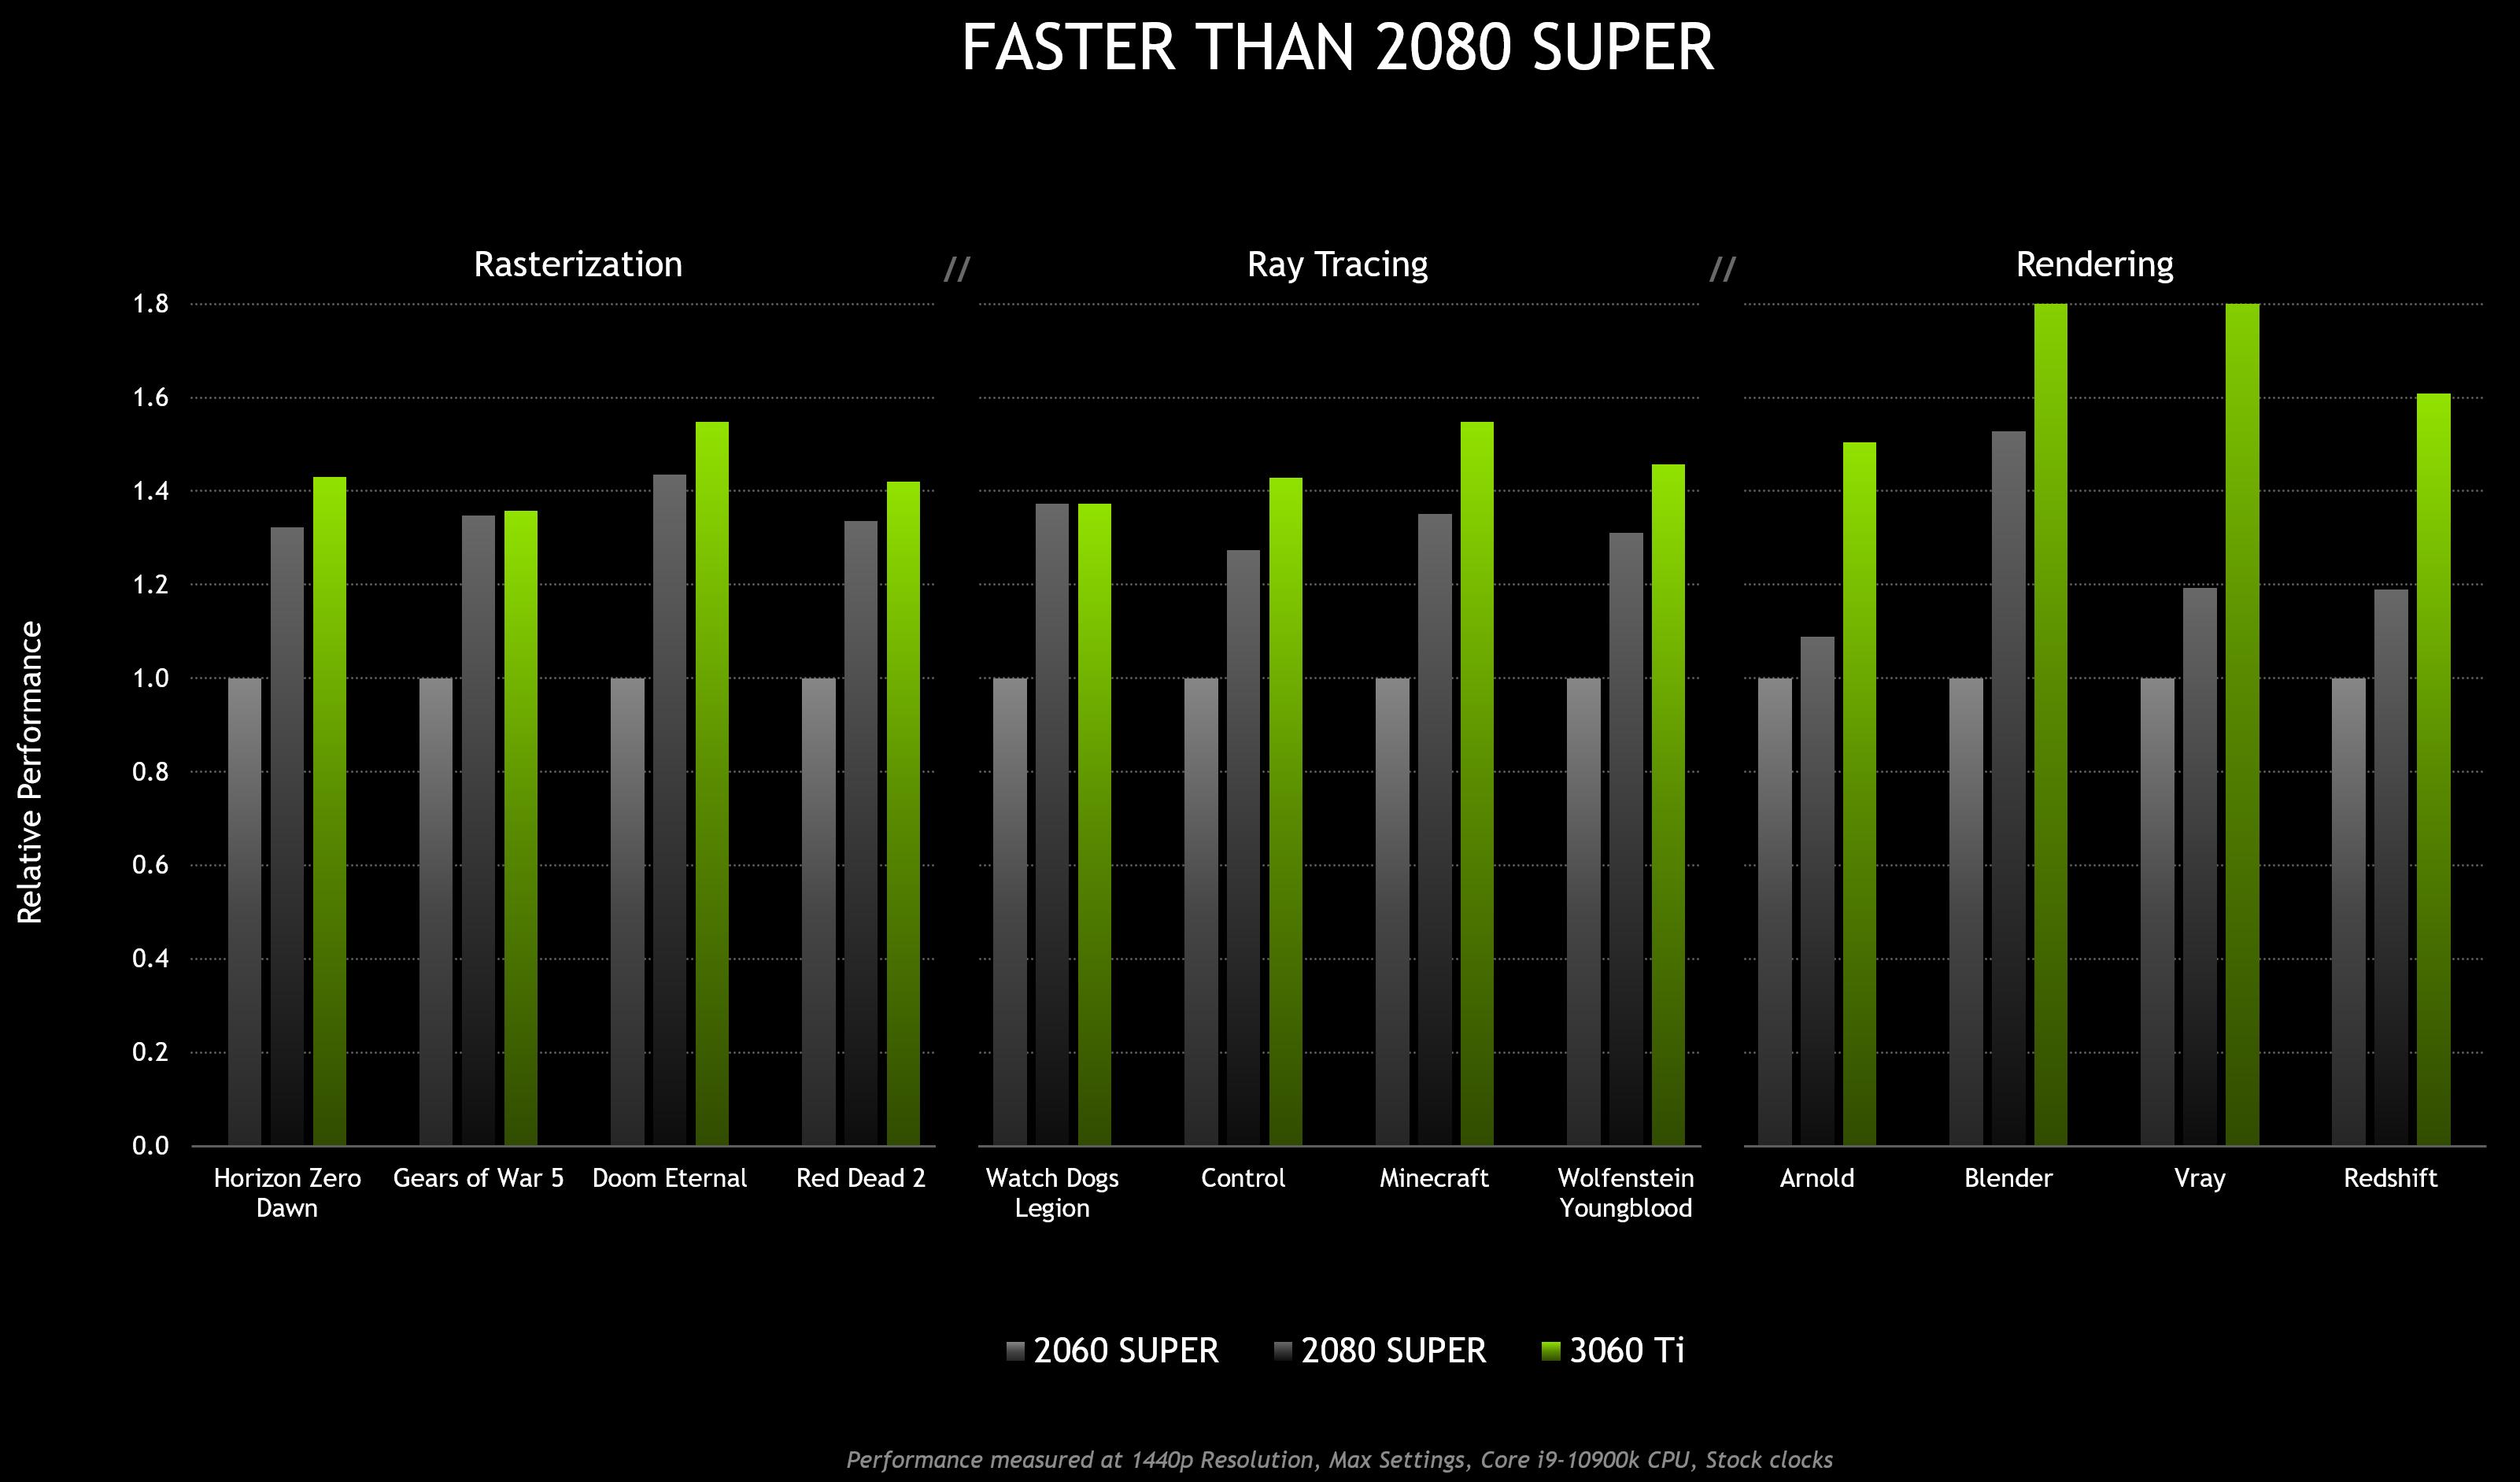 https://www.nvidia.com/content/dam/en-zz/Solutions/geforce/news/geforce-rtx-3060-ti-out-december-2/nvidia-geforce-rtx-3060-ti-performance.jpg